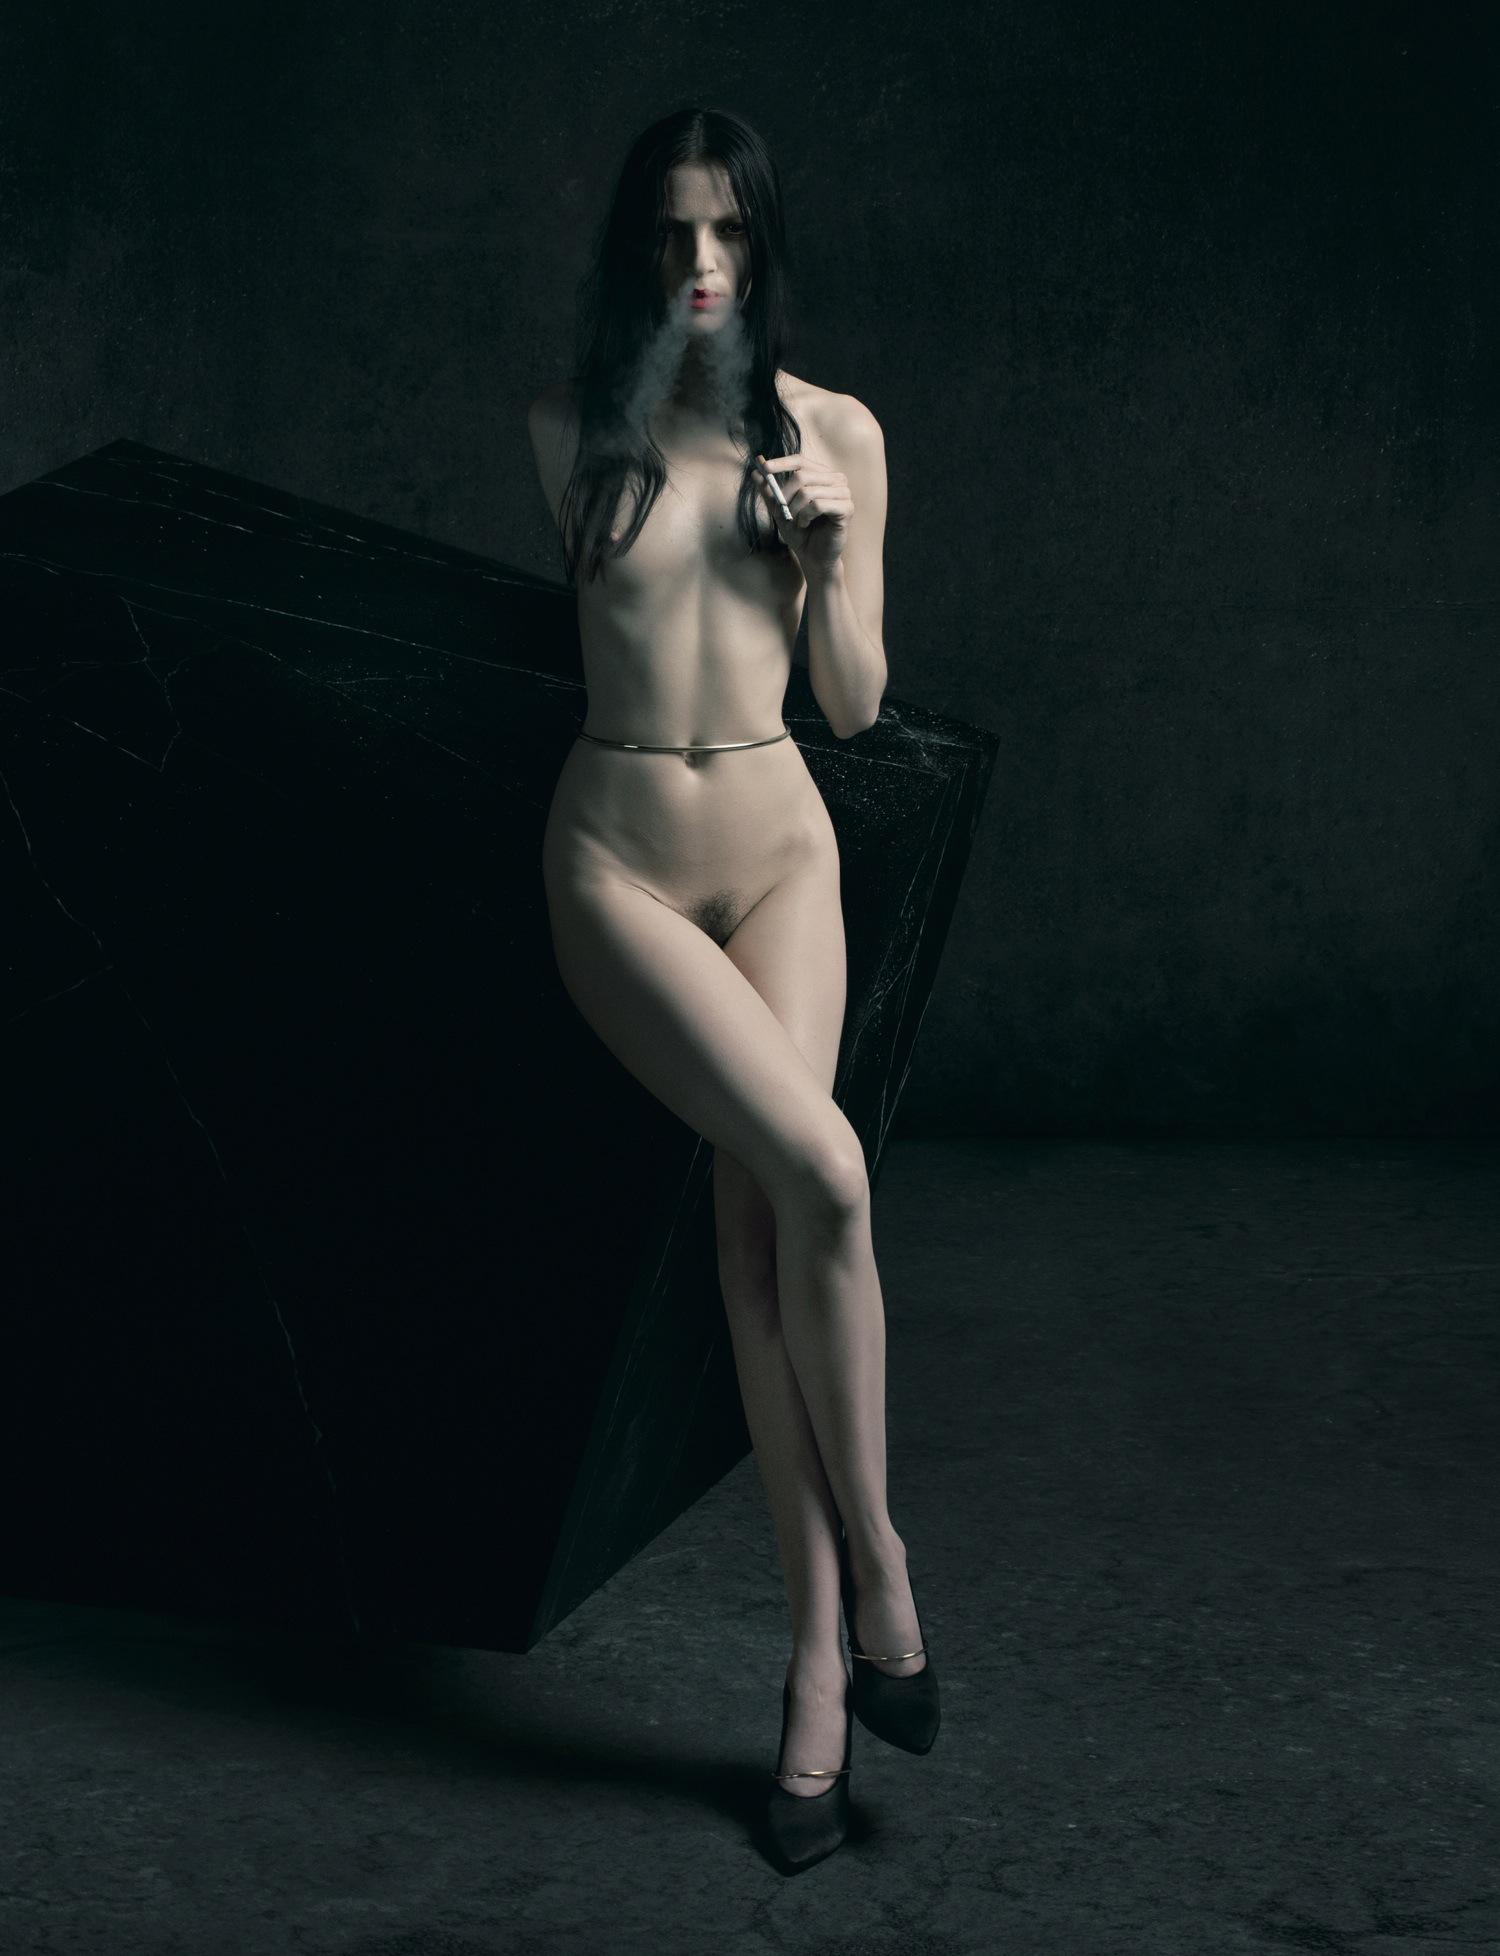 Mariacarla boscono nude 4